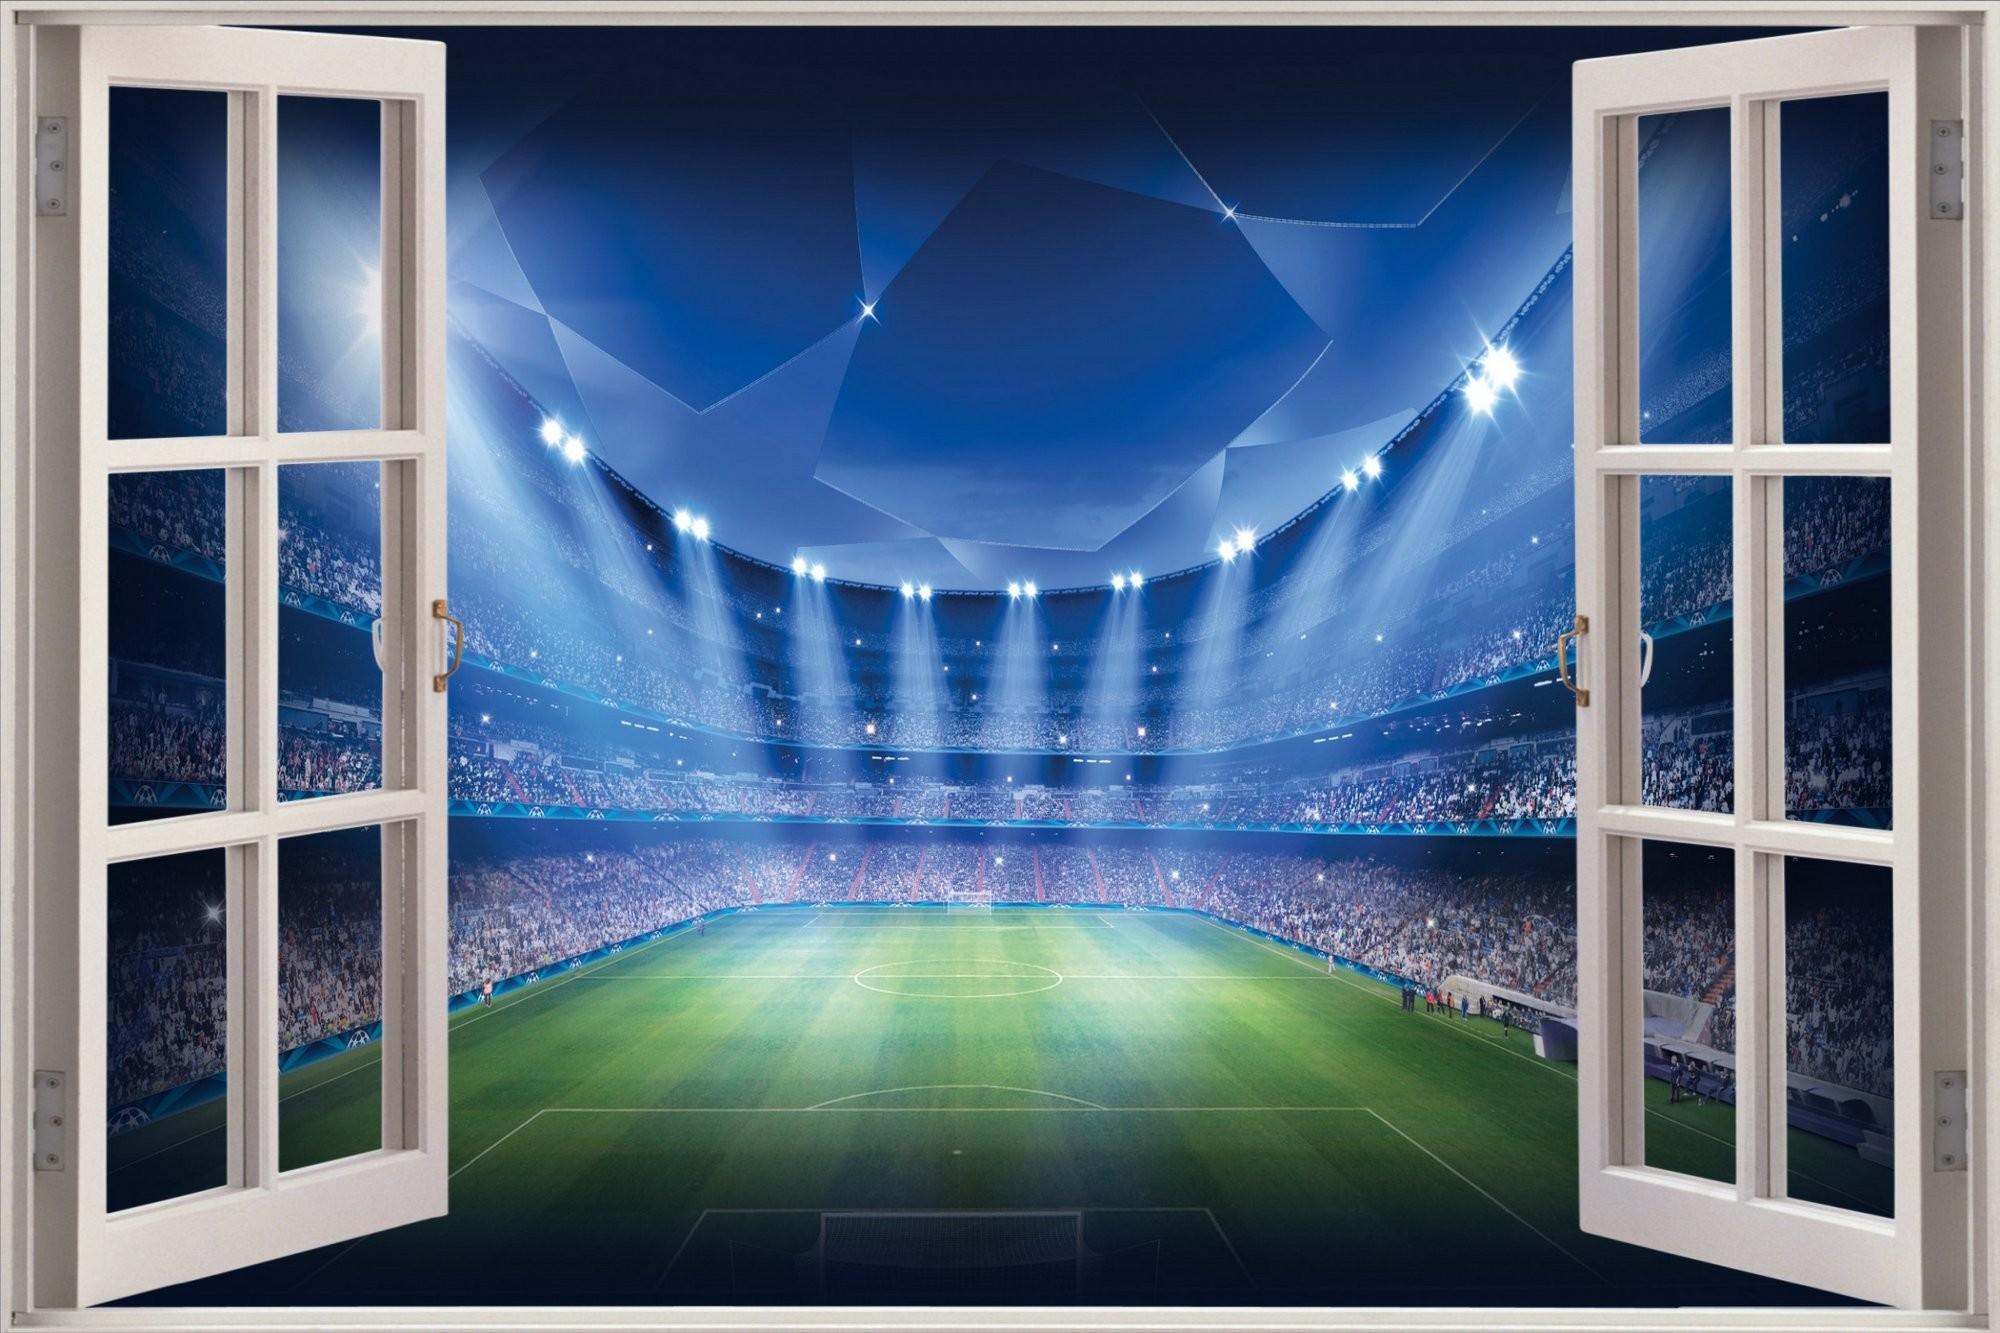 Stadium Floodlights Wallpaper Wall Decor. soccer bedroom ideas photo 7  Soccer bedroom ideas Bedroom at Real Estate Football Murals For.